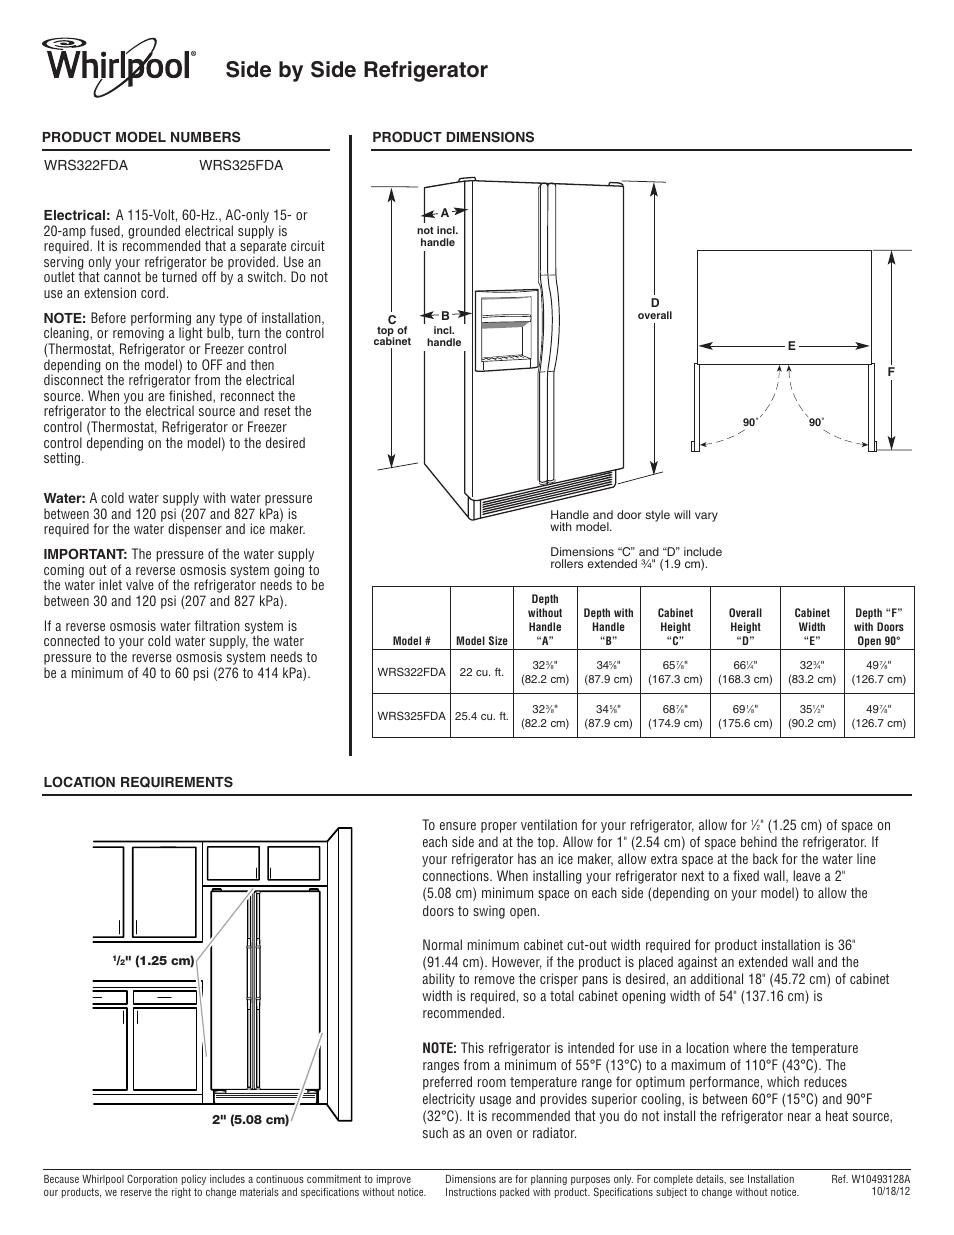 whirlpool wrs322fdam user manual